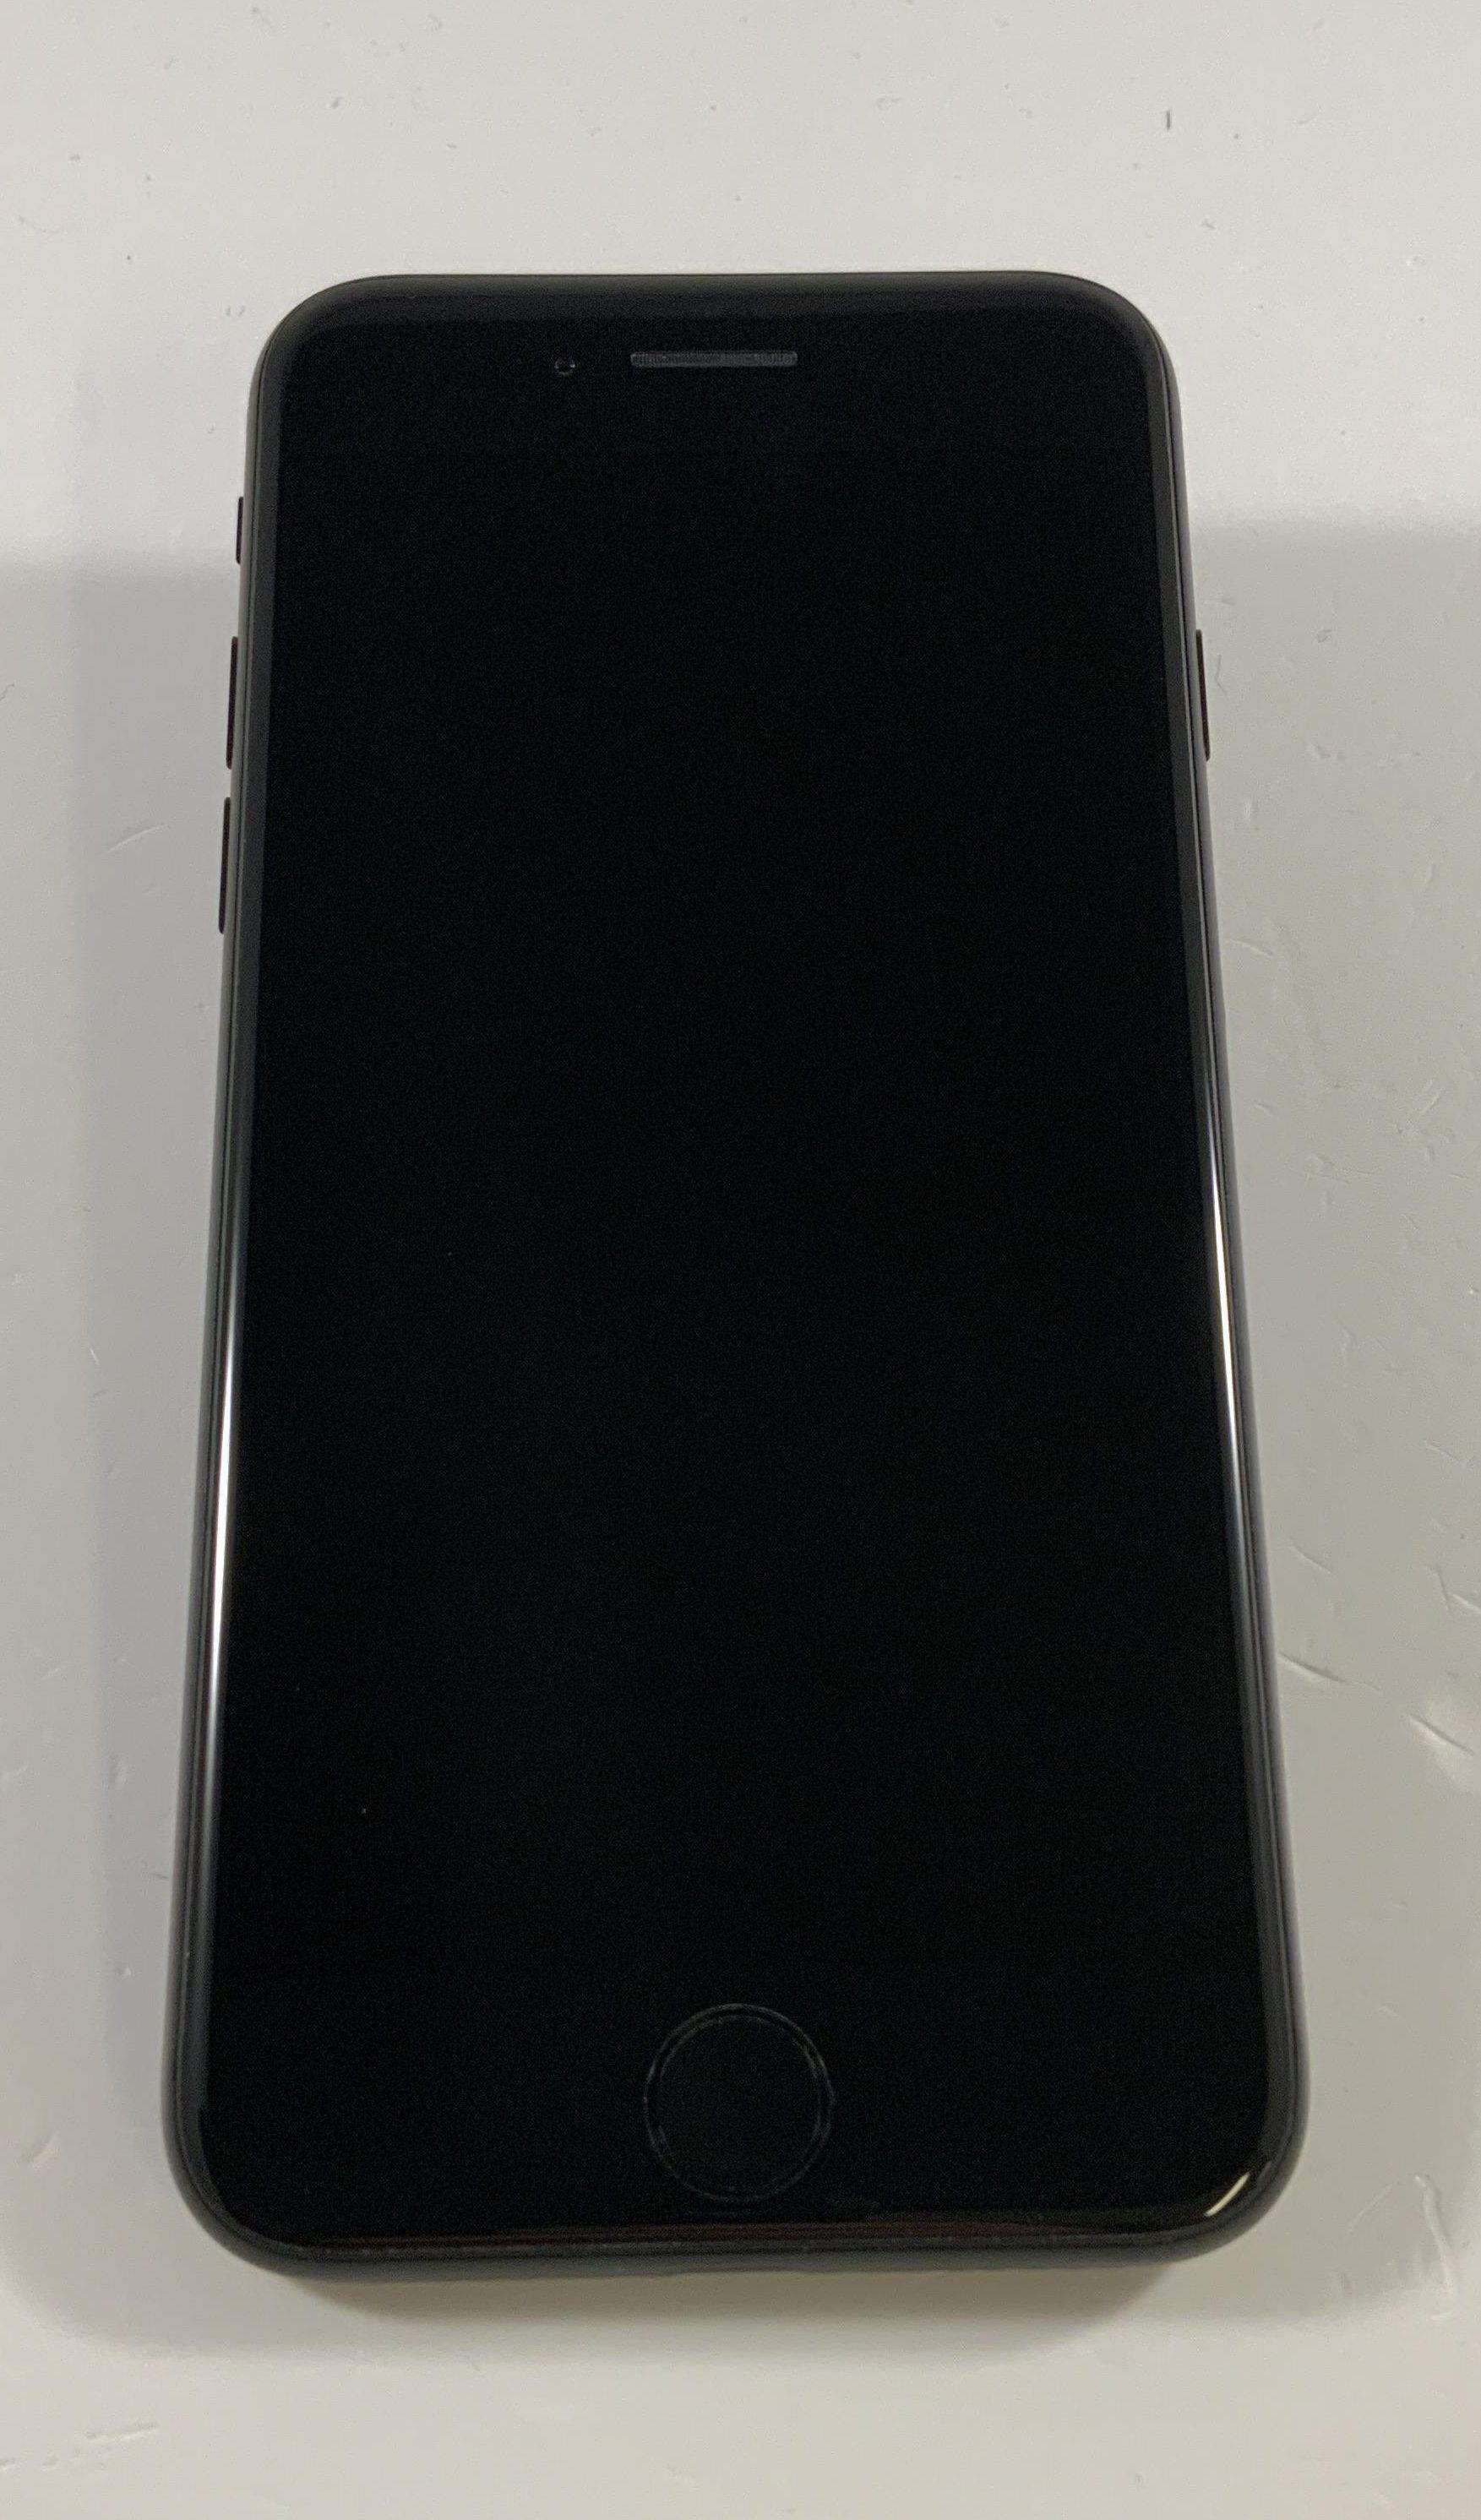 iPhone SE (2nd Gen) 128GB, 128GB, Black, imagen 1